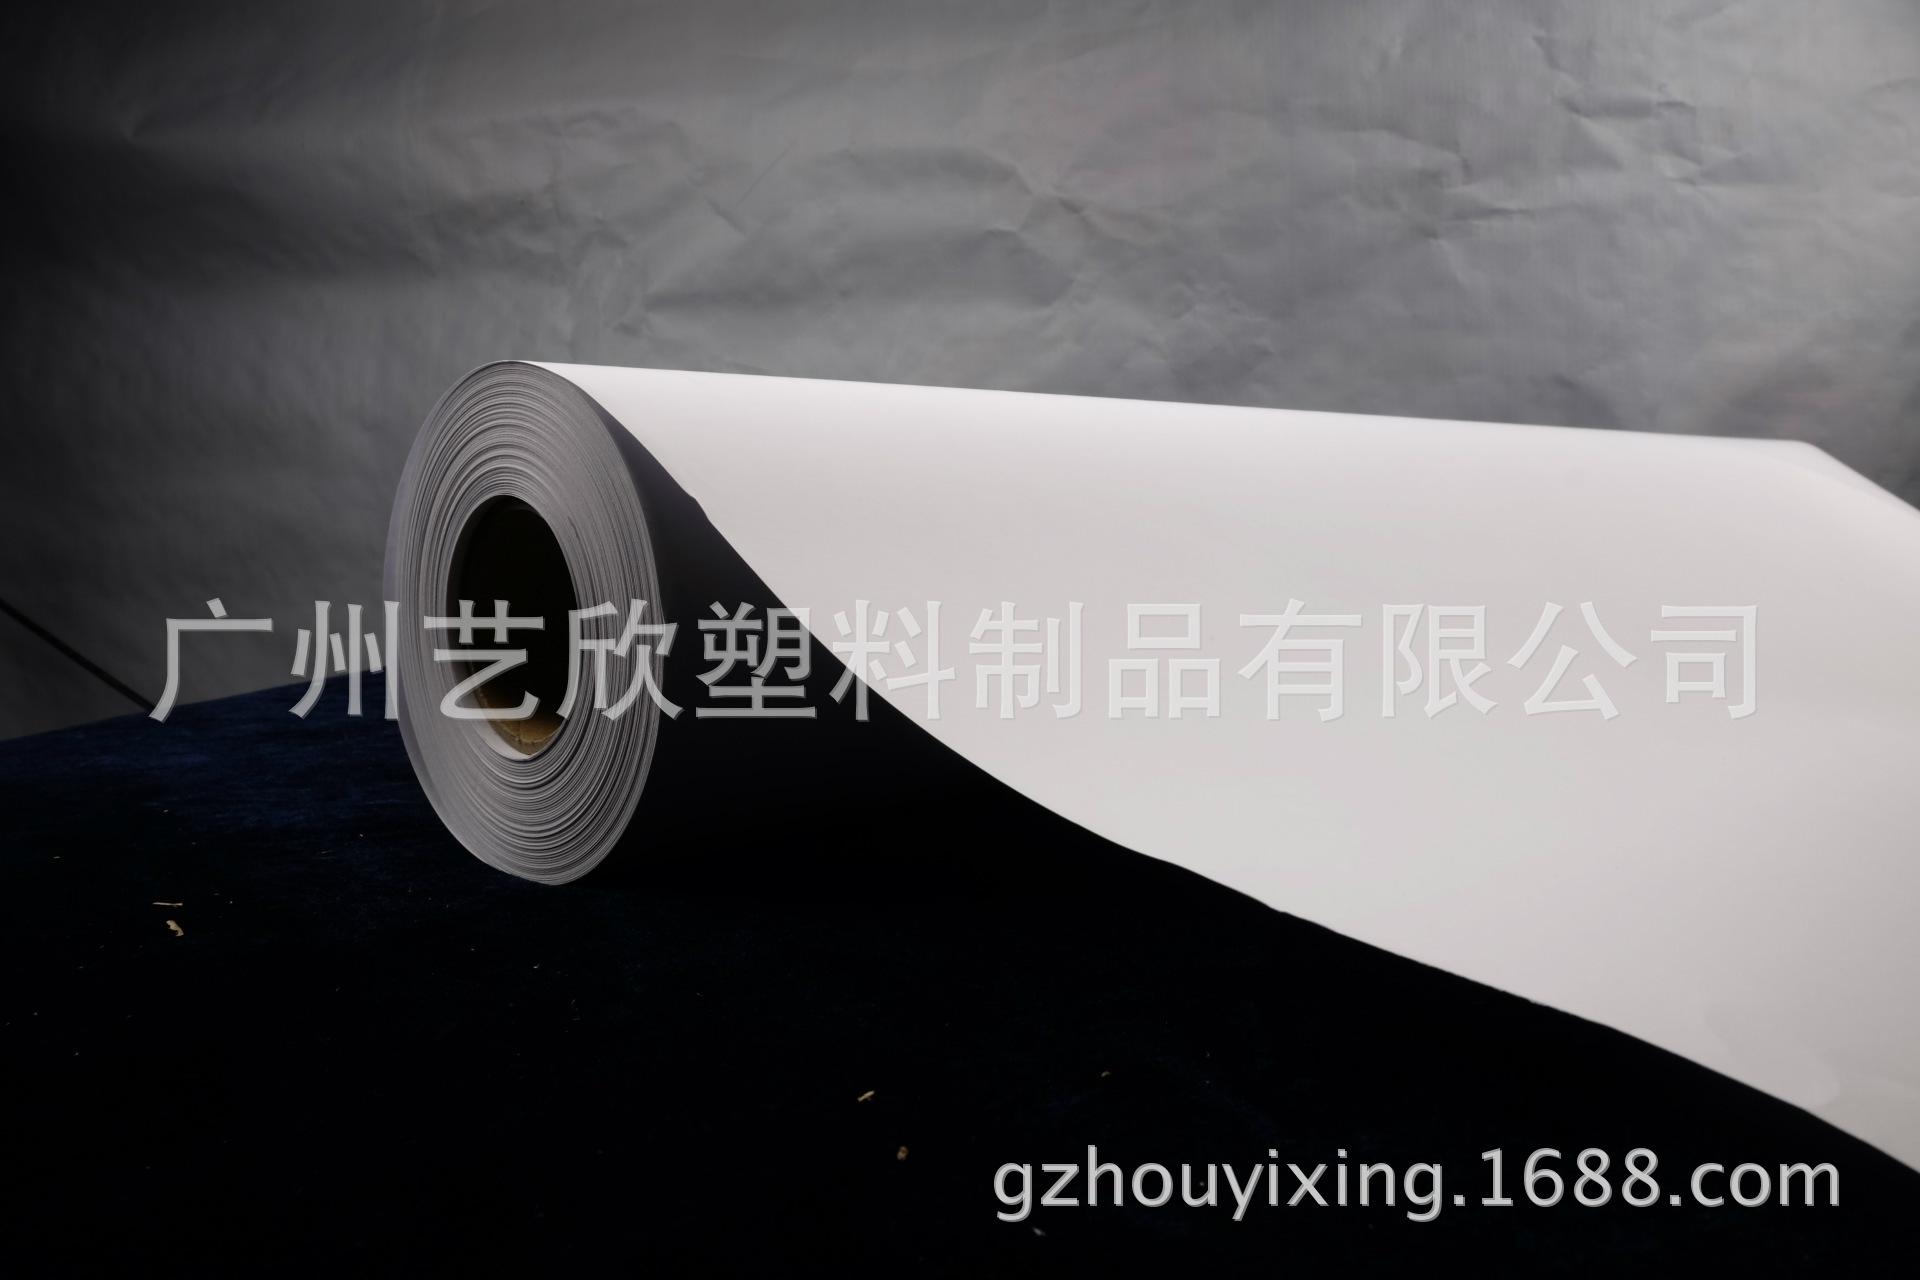 128g高品质防水彩喷纸 高光彩喷相纸 背胶彩喷纸